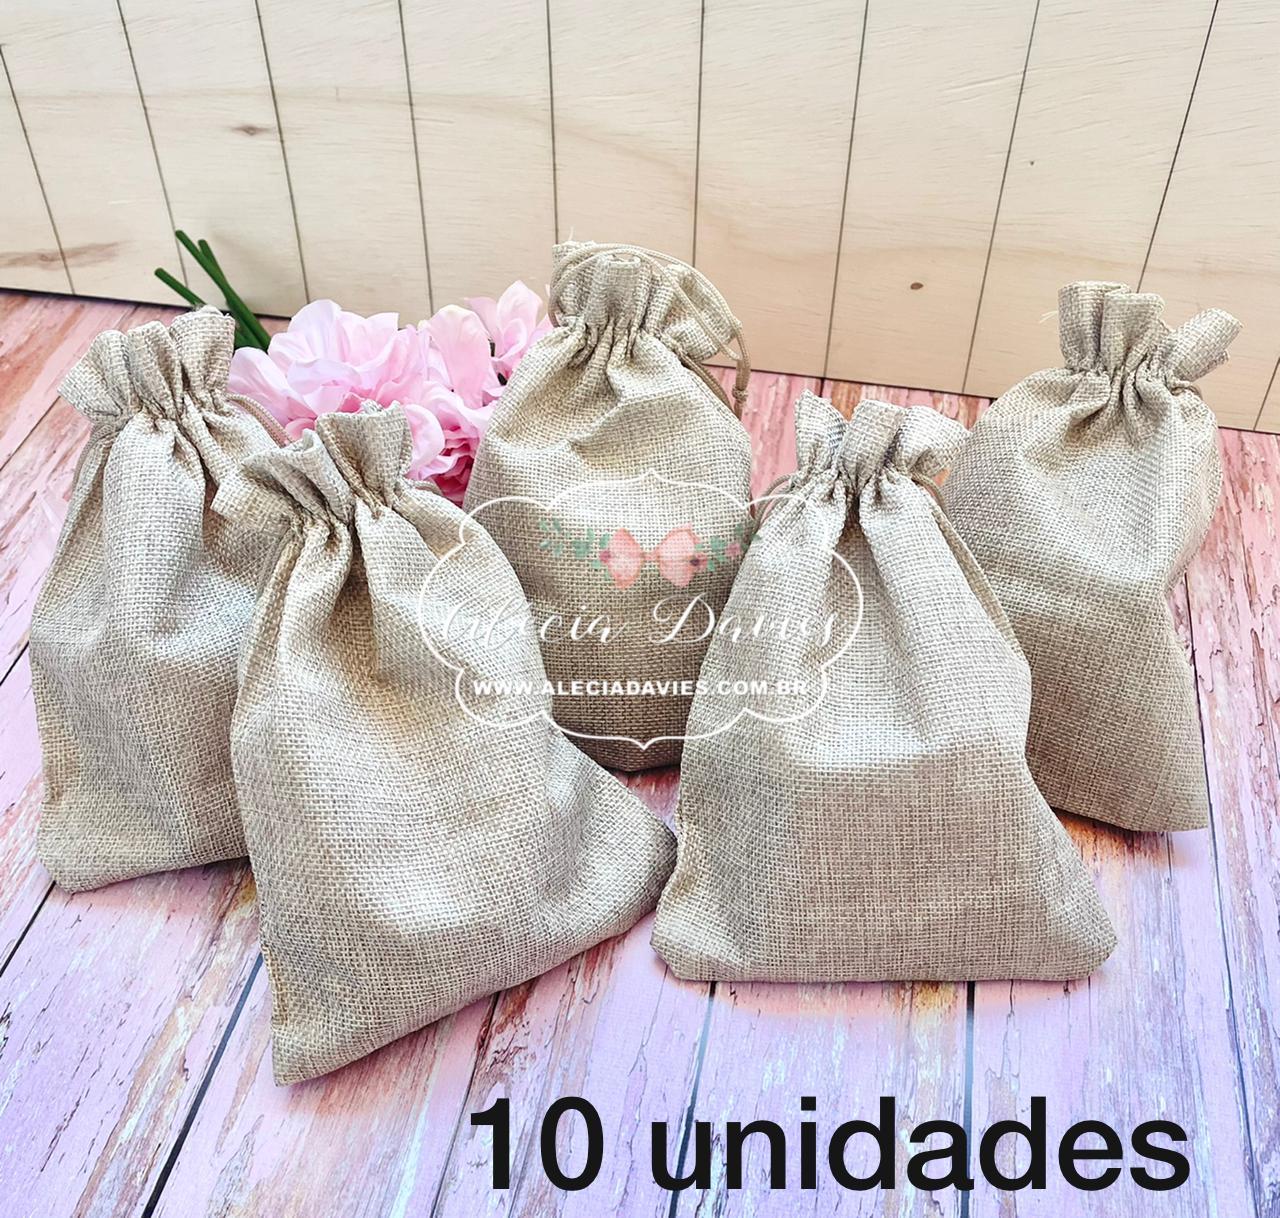 SAQUINHO ESTILO JUTA 10 UNIDADES COR NATURAL